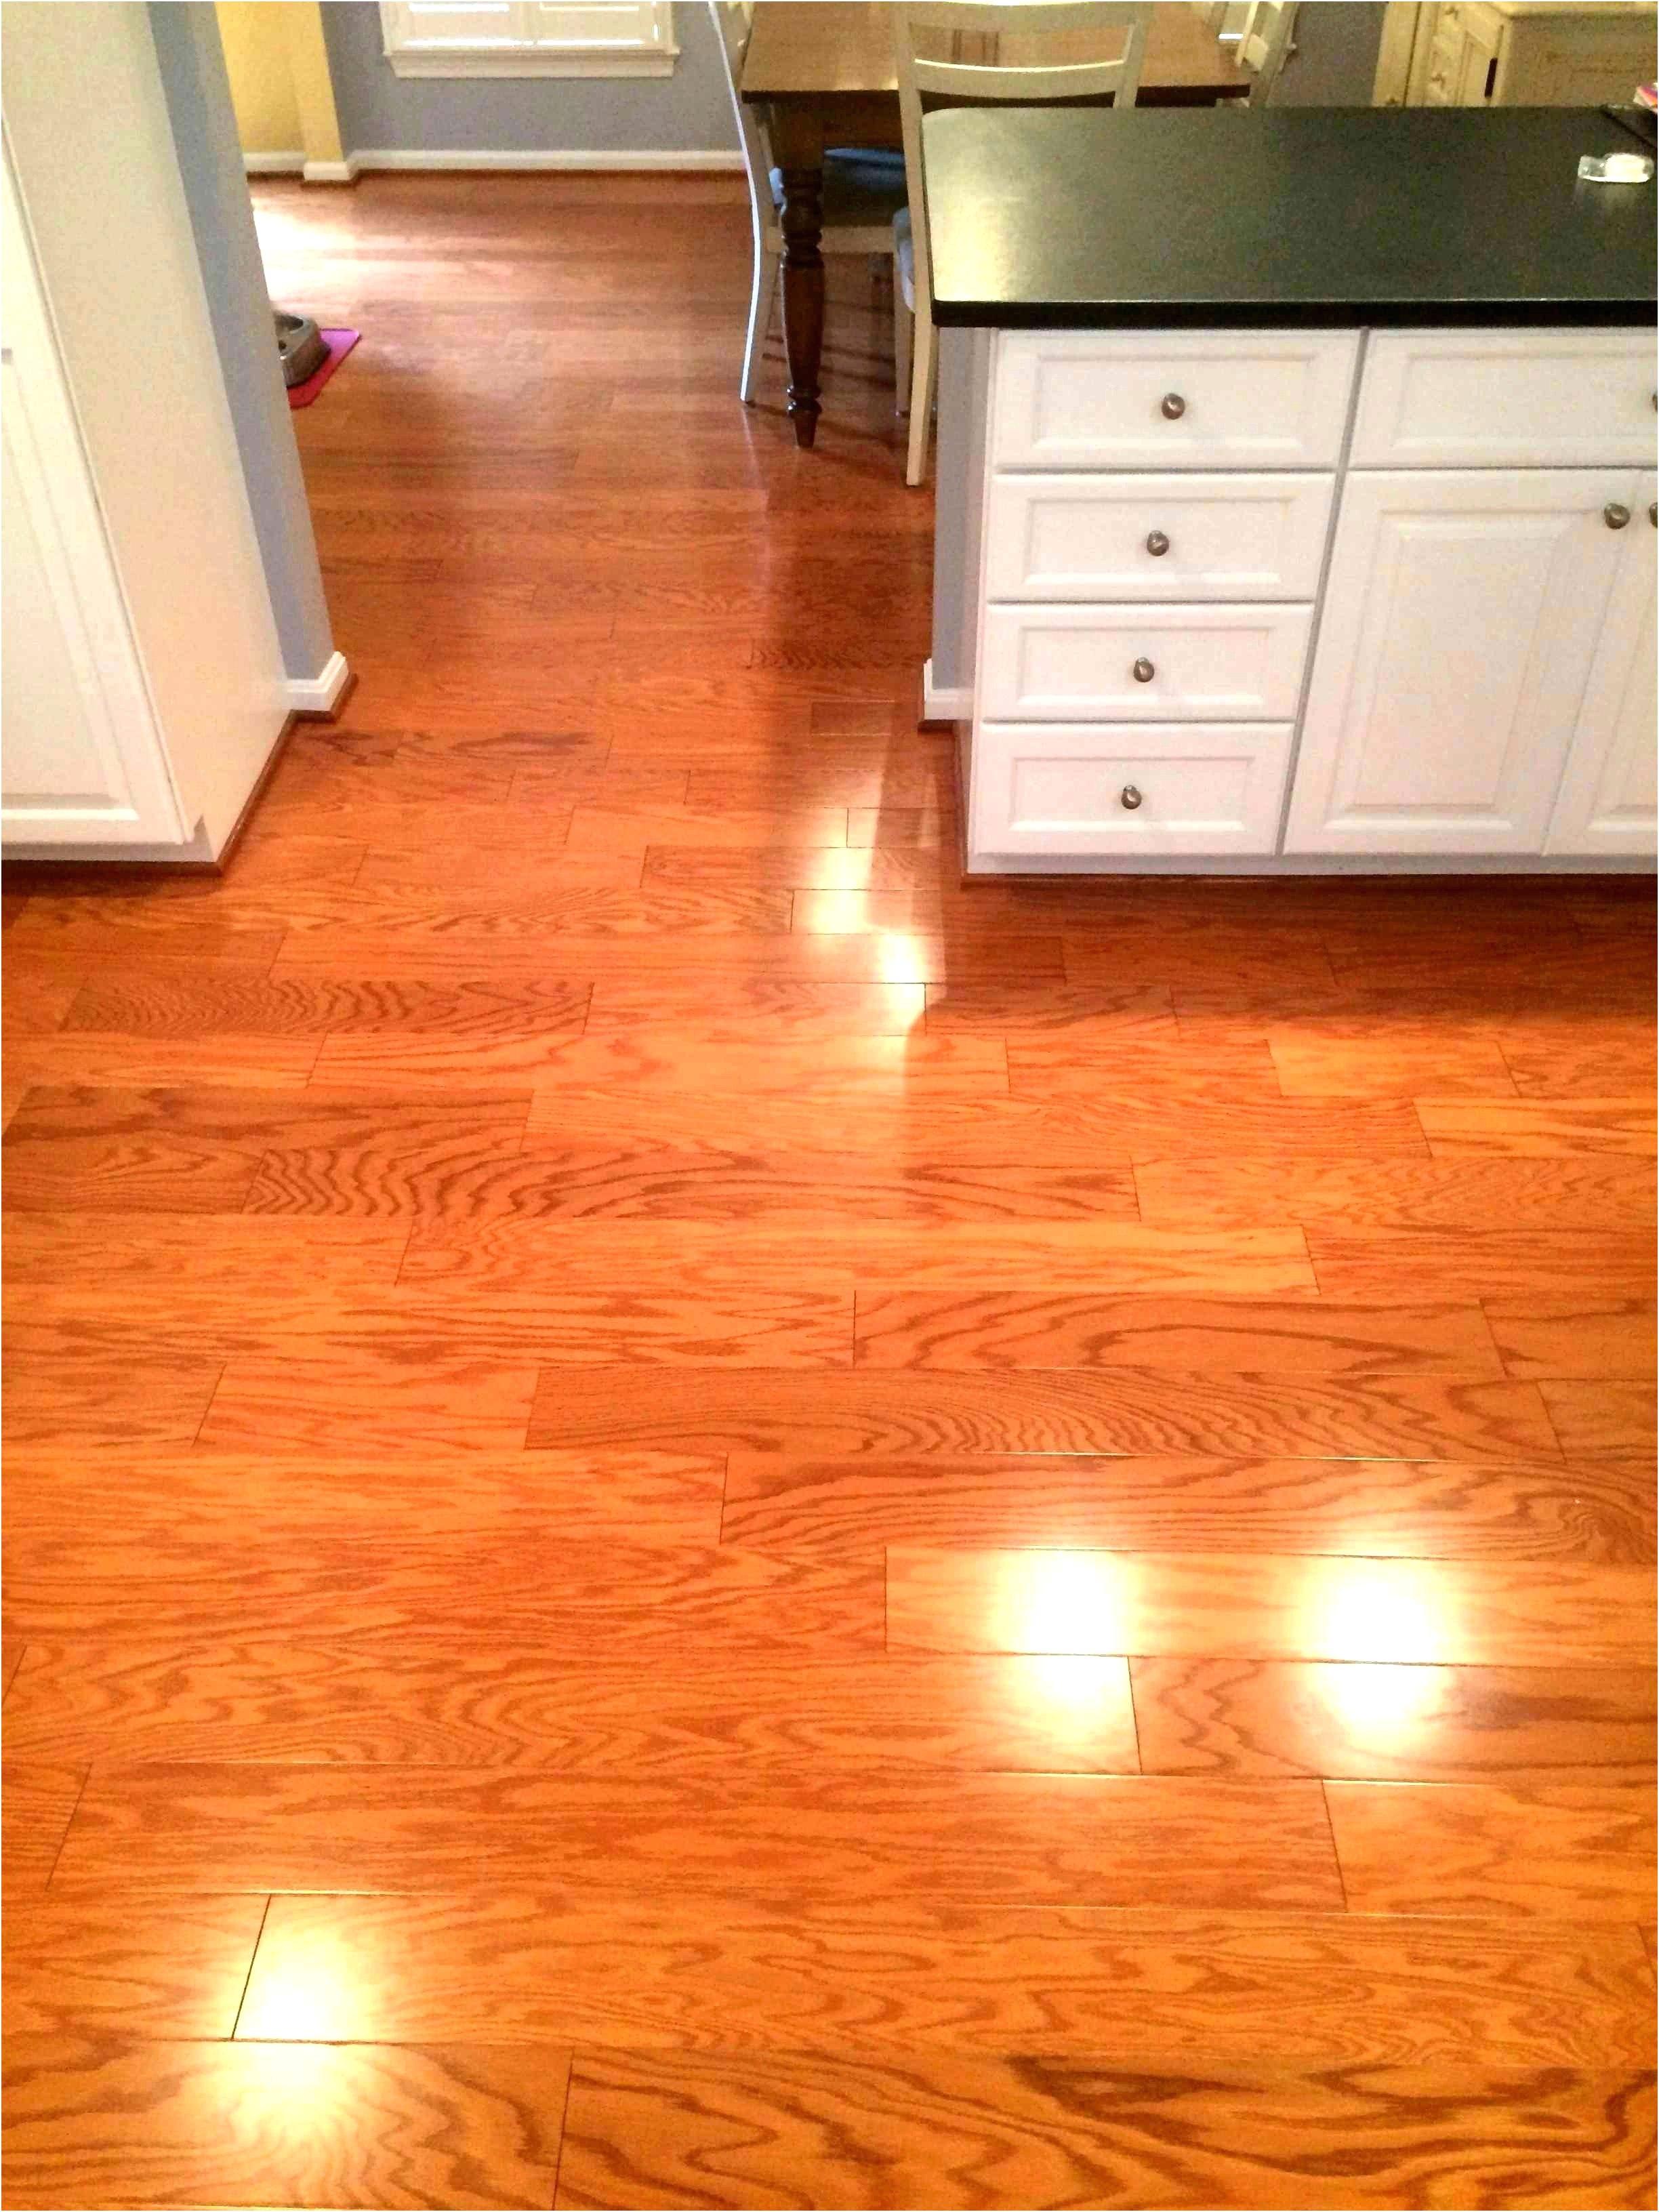 The Best Vacuum Cleaner for Wood Floors and Carpets Non Slip Hardwood Floor Podemosleganes